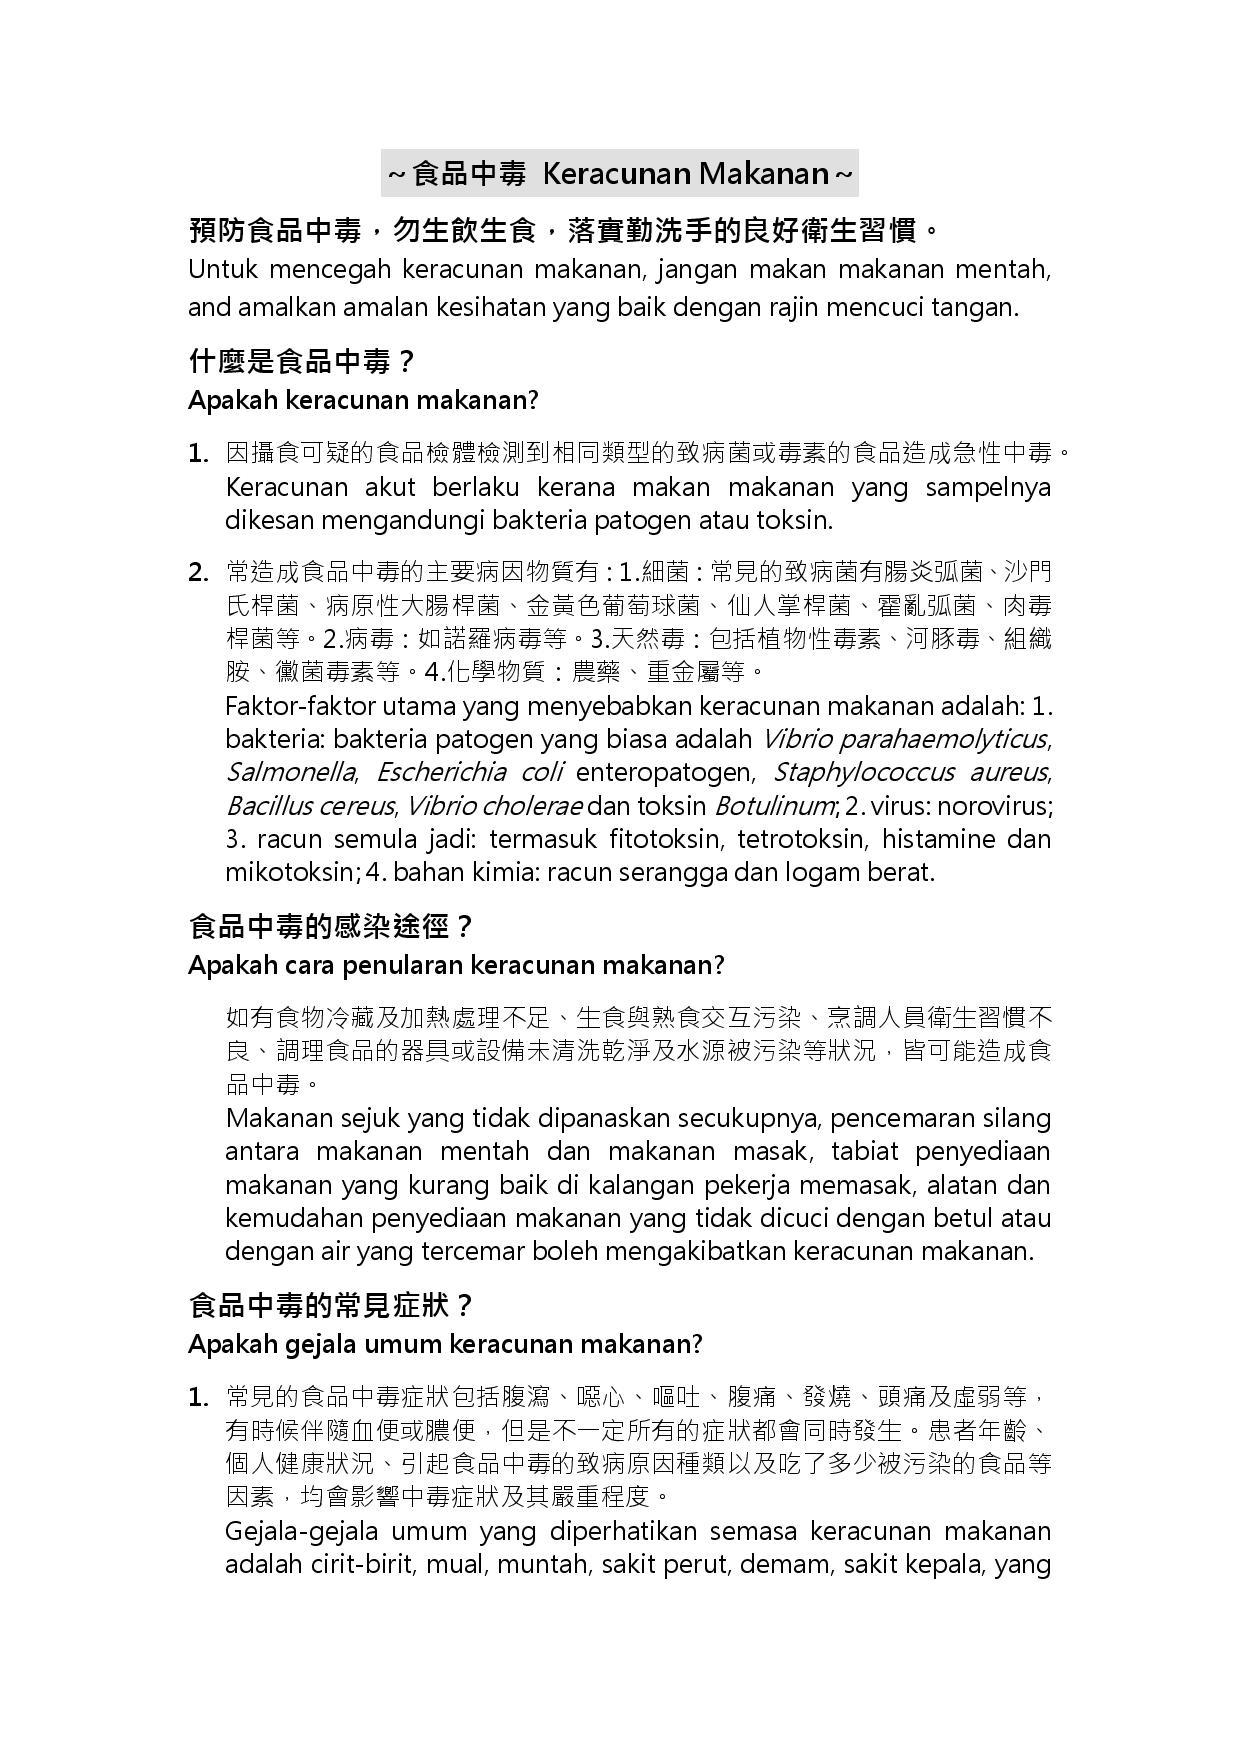 詳如附件【klik saya】Untuk mencegah keracunan makanan(Halaman 1)預防食品中毒(馬來文)